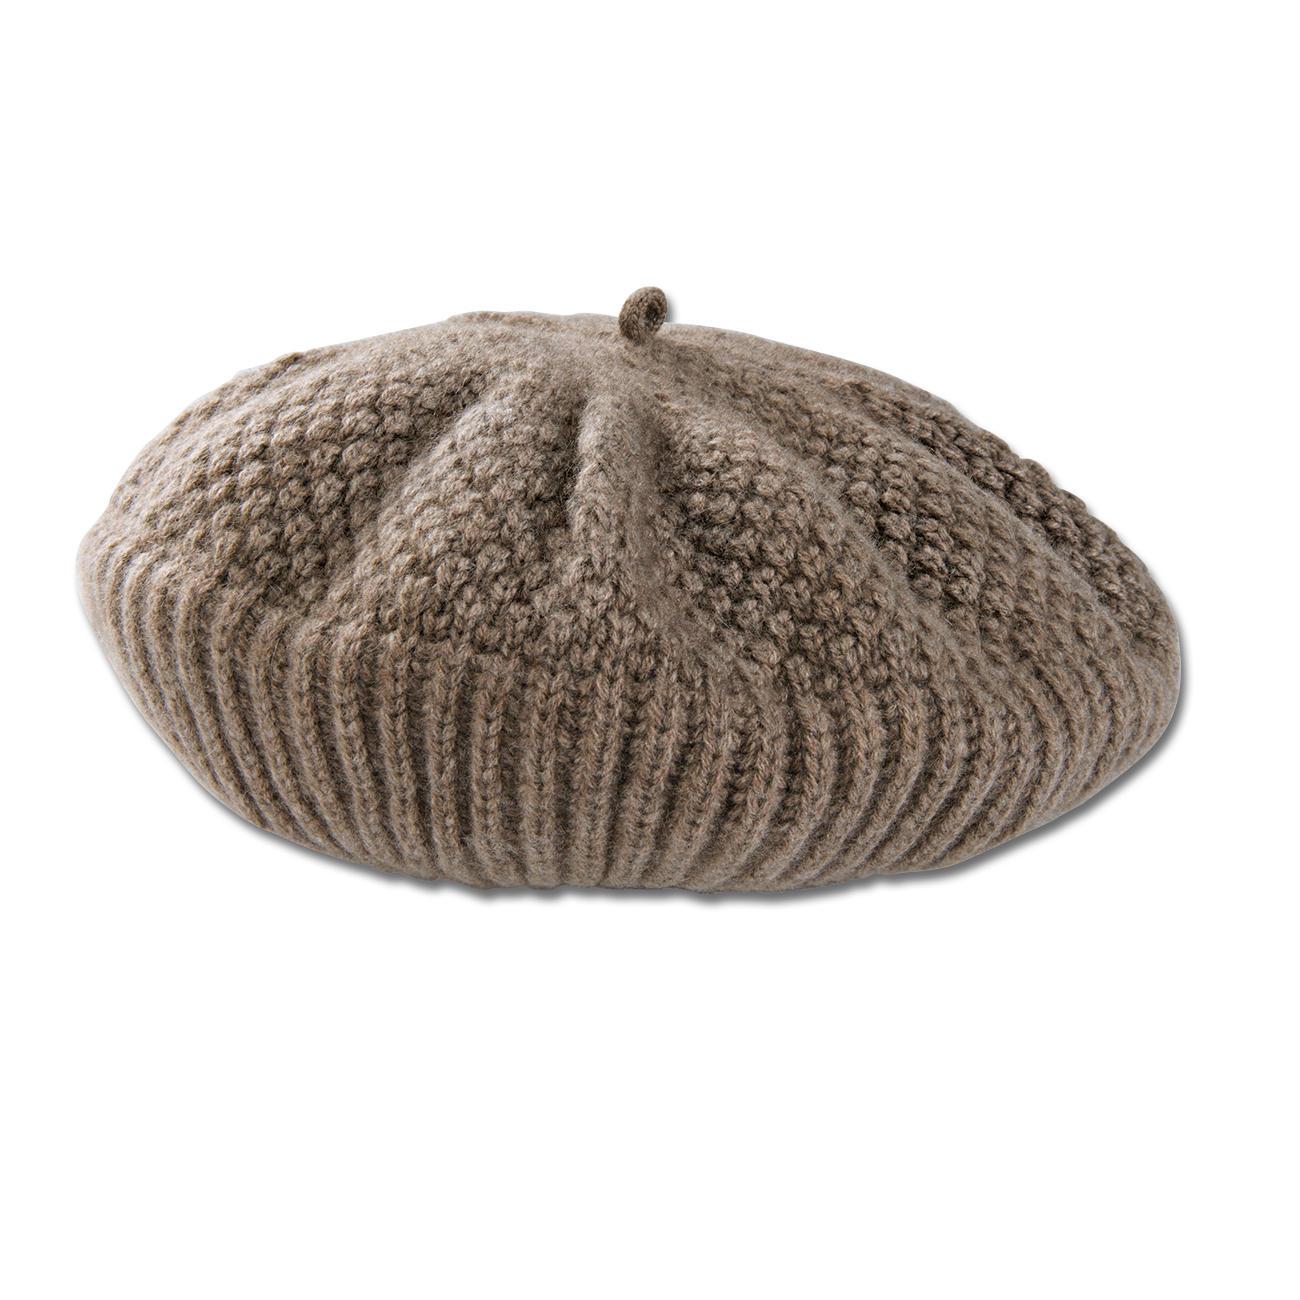 Cashmere Beret Knitting Pattern : Buy Cashmere Beret, Scarf or Cashmere Gloves online